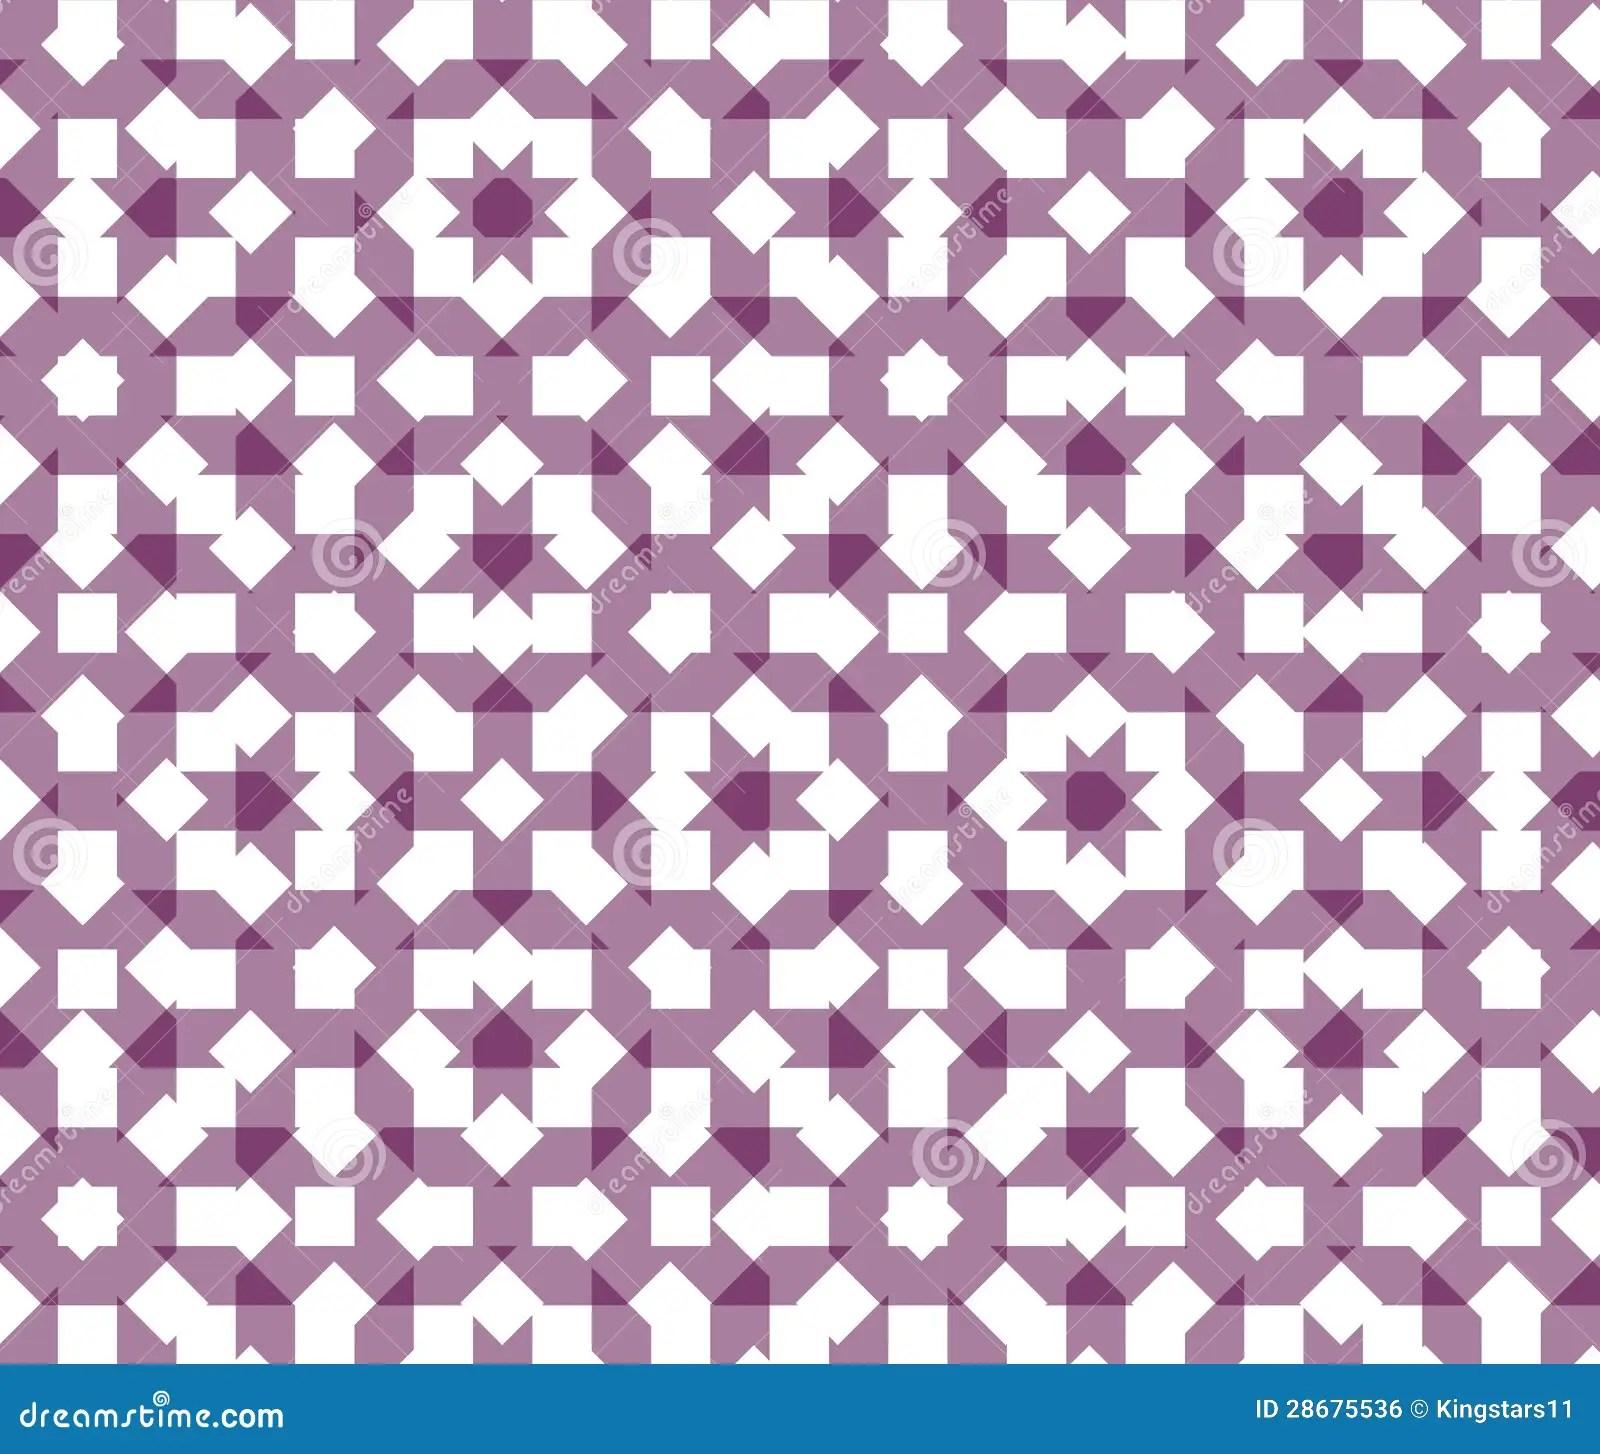 Black And White Wallpaper Decor Islamic Geometric Pattern Stock Illustration Image Of